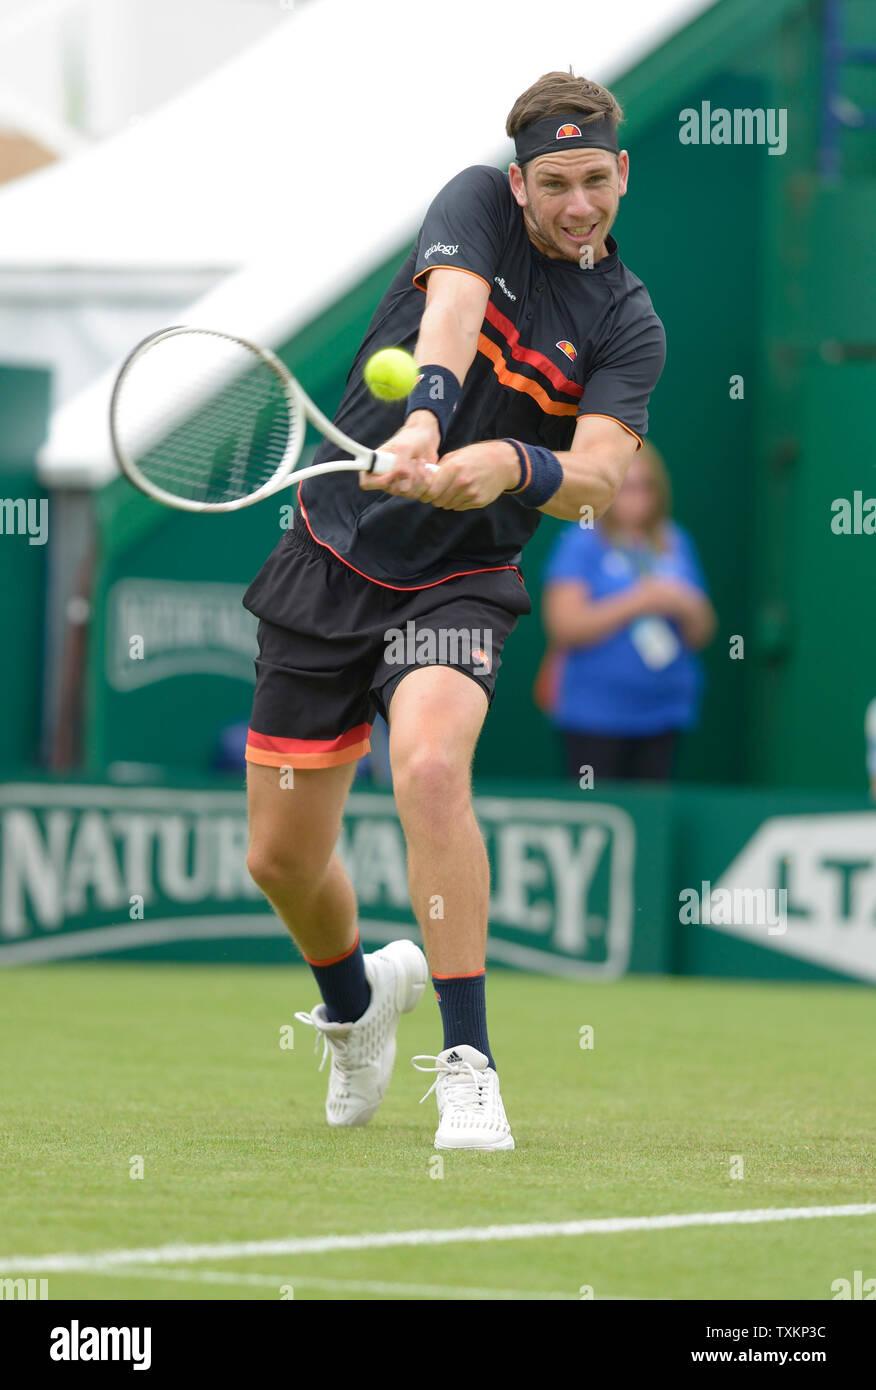 Cameron Norrie (GBR) in Eastbourne, UK. 25. Juni 2019. Natur Tal International Tennis in Devonshire Park. Stockfoto